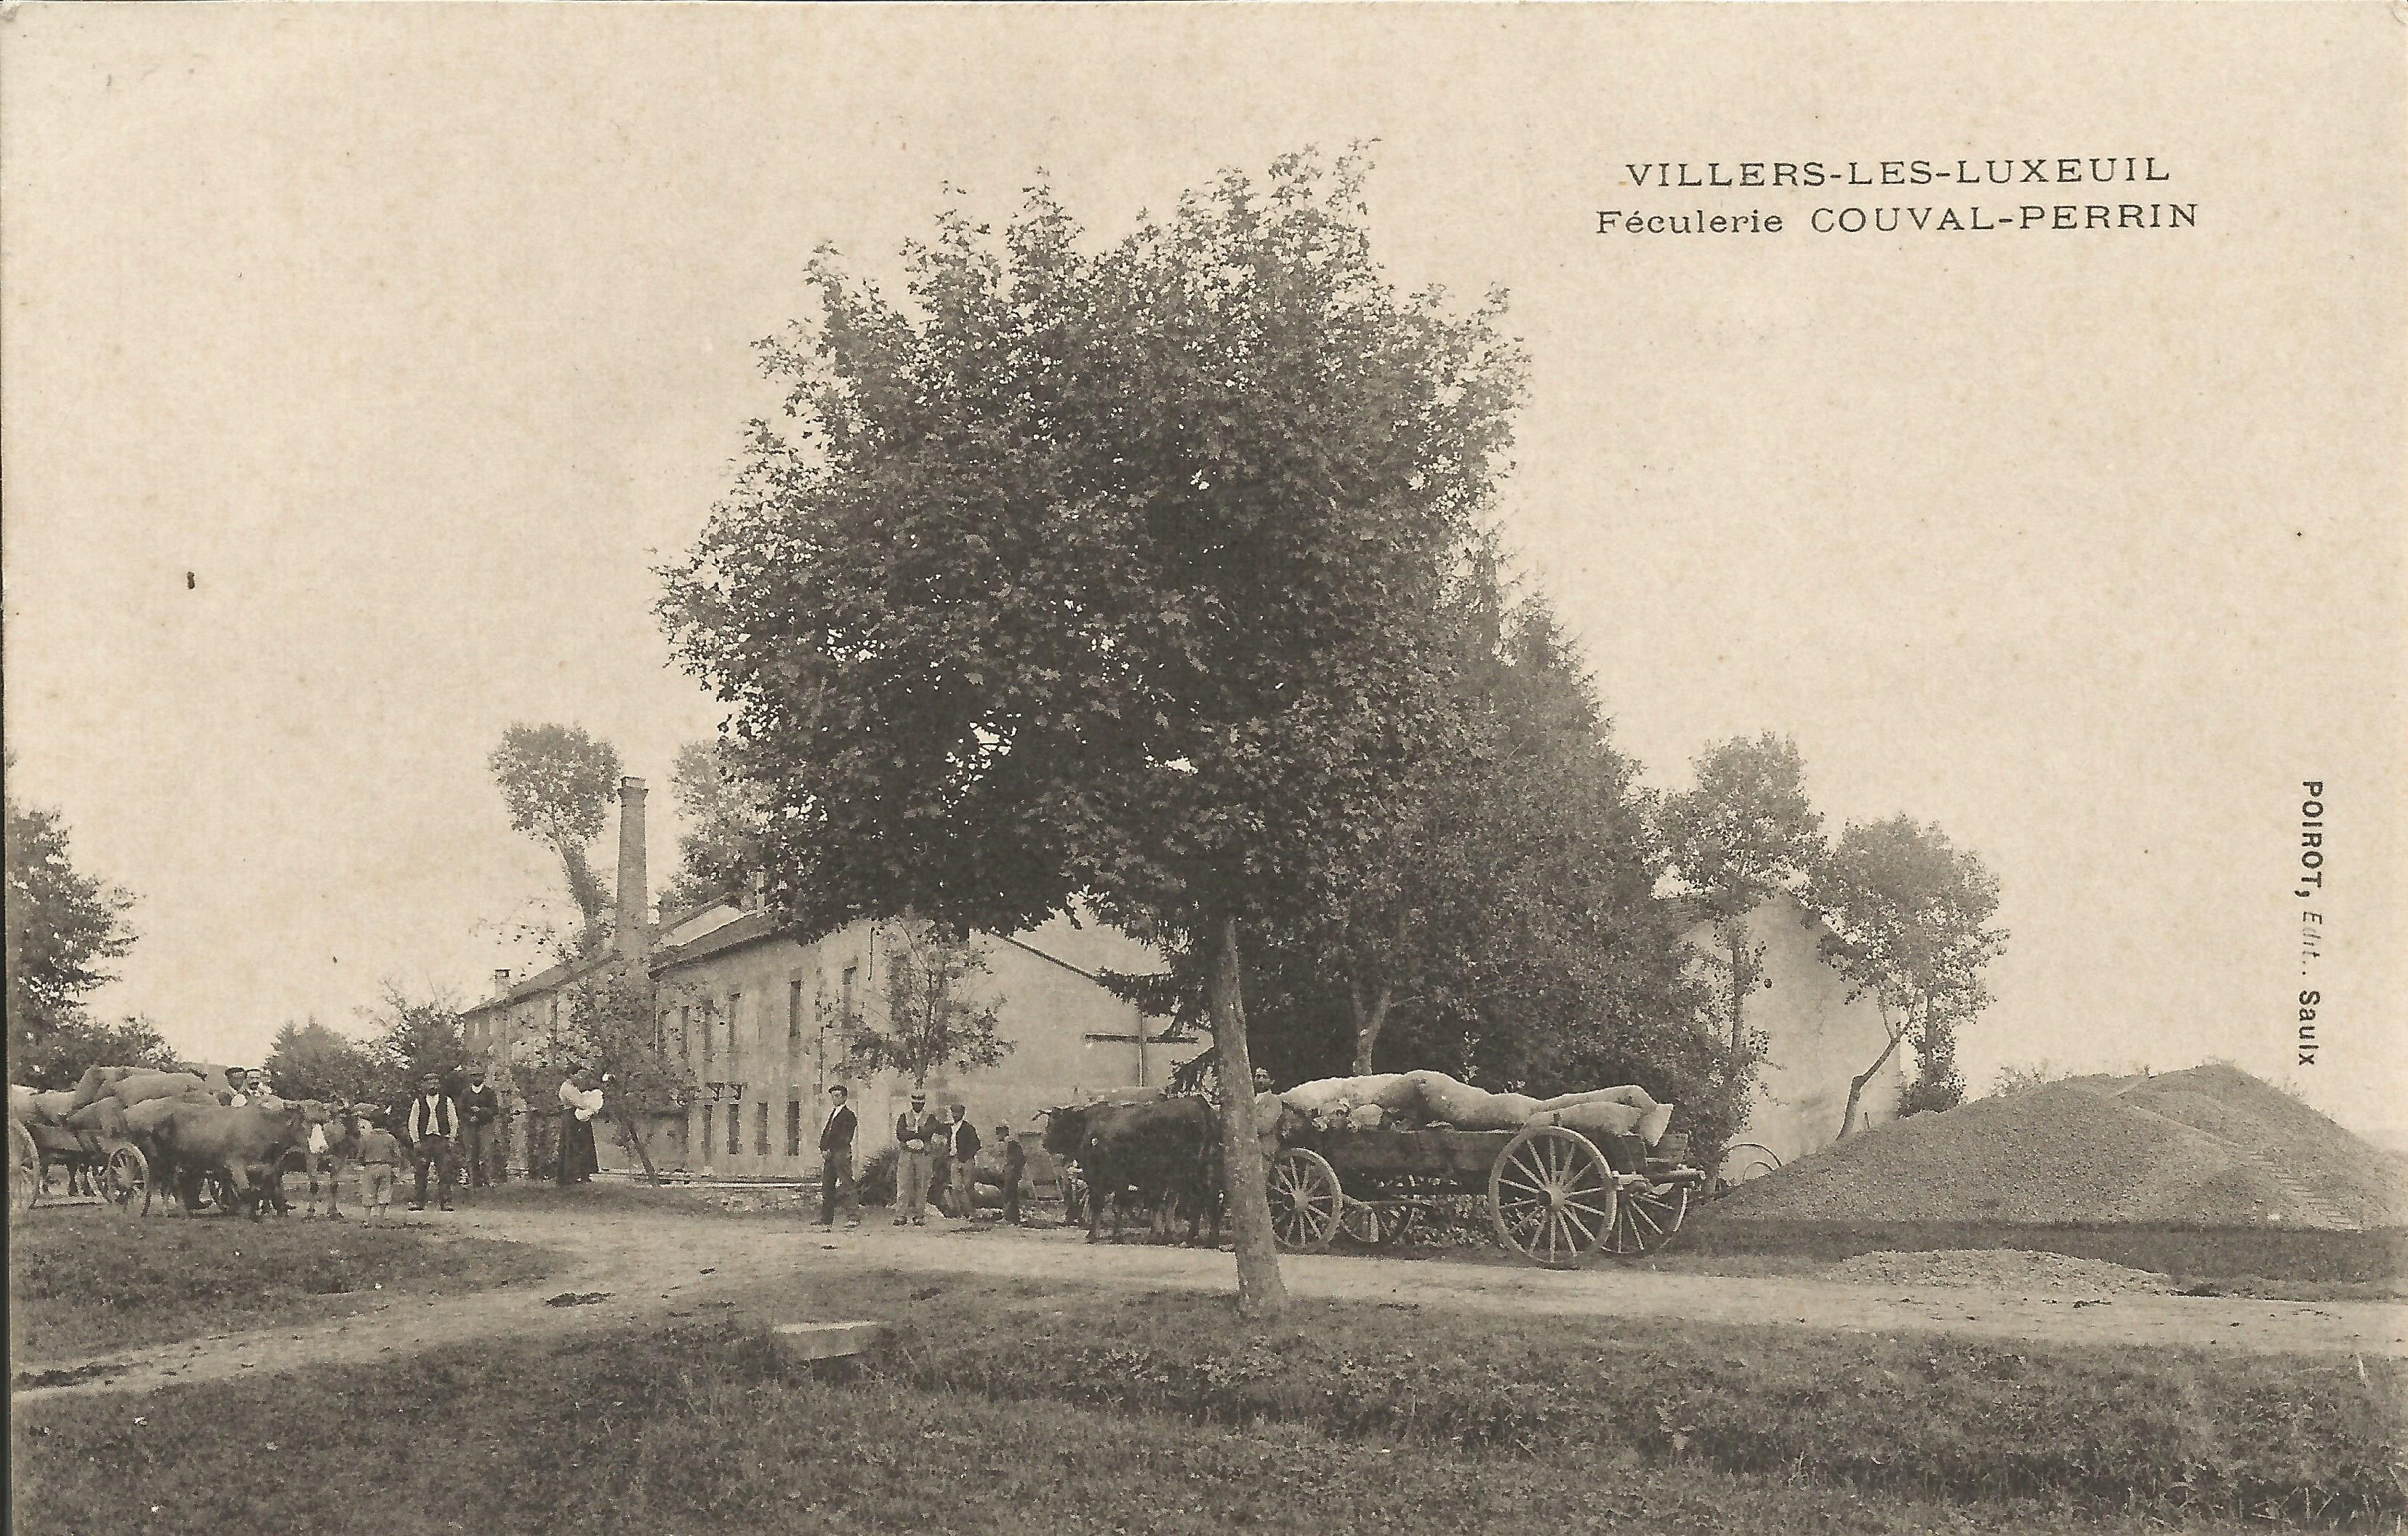 https://www.villers-les-luxeuil.com/projets/villers/files/images/Cartes_postales/Feculerie_2015/Feculerie_4_1908.jpg